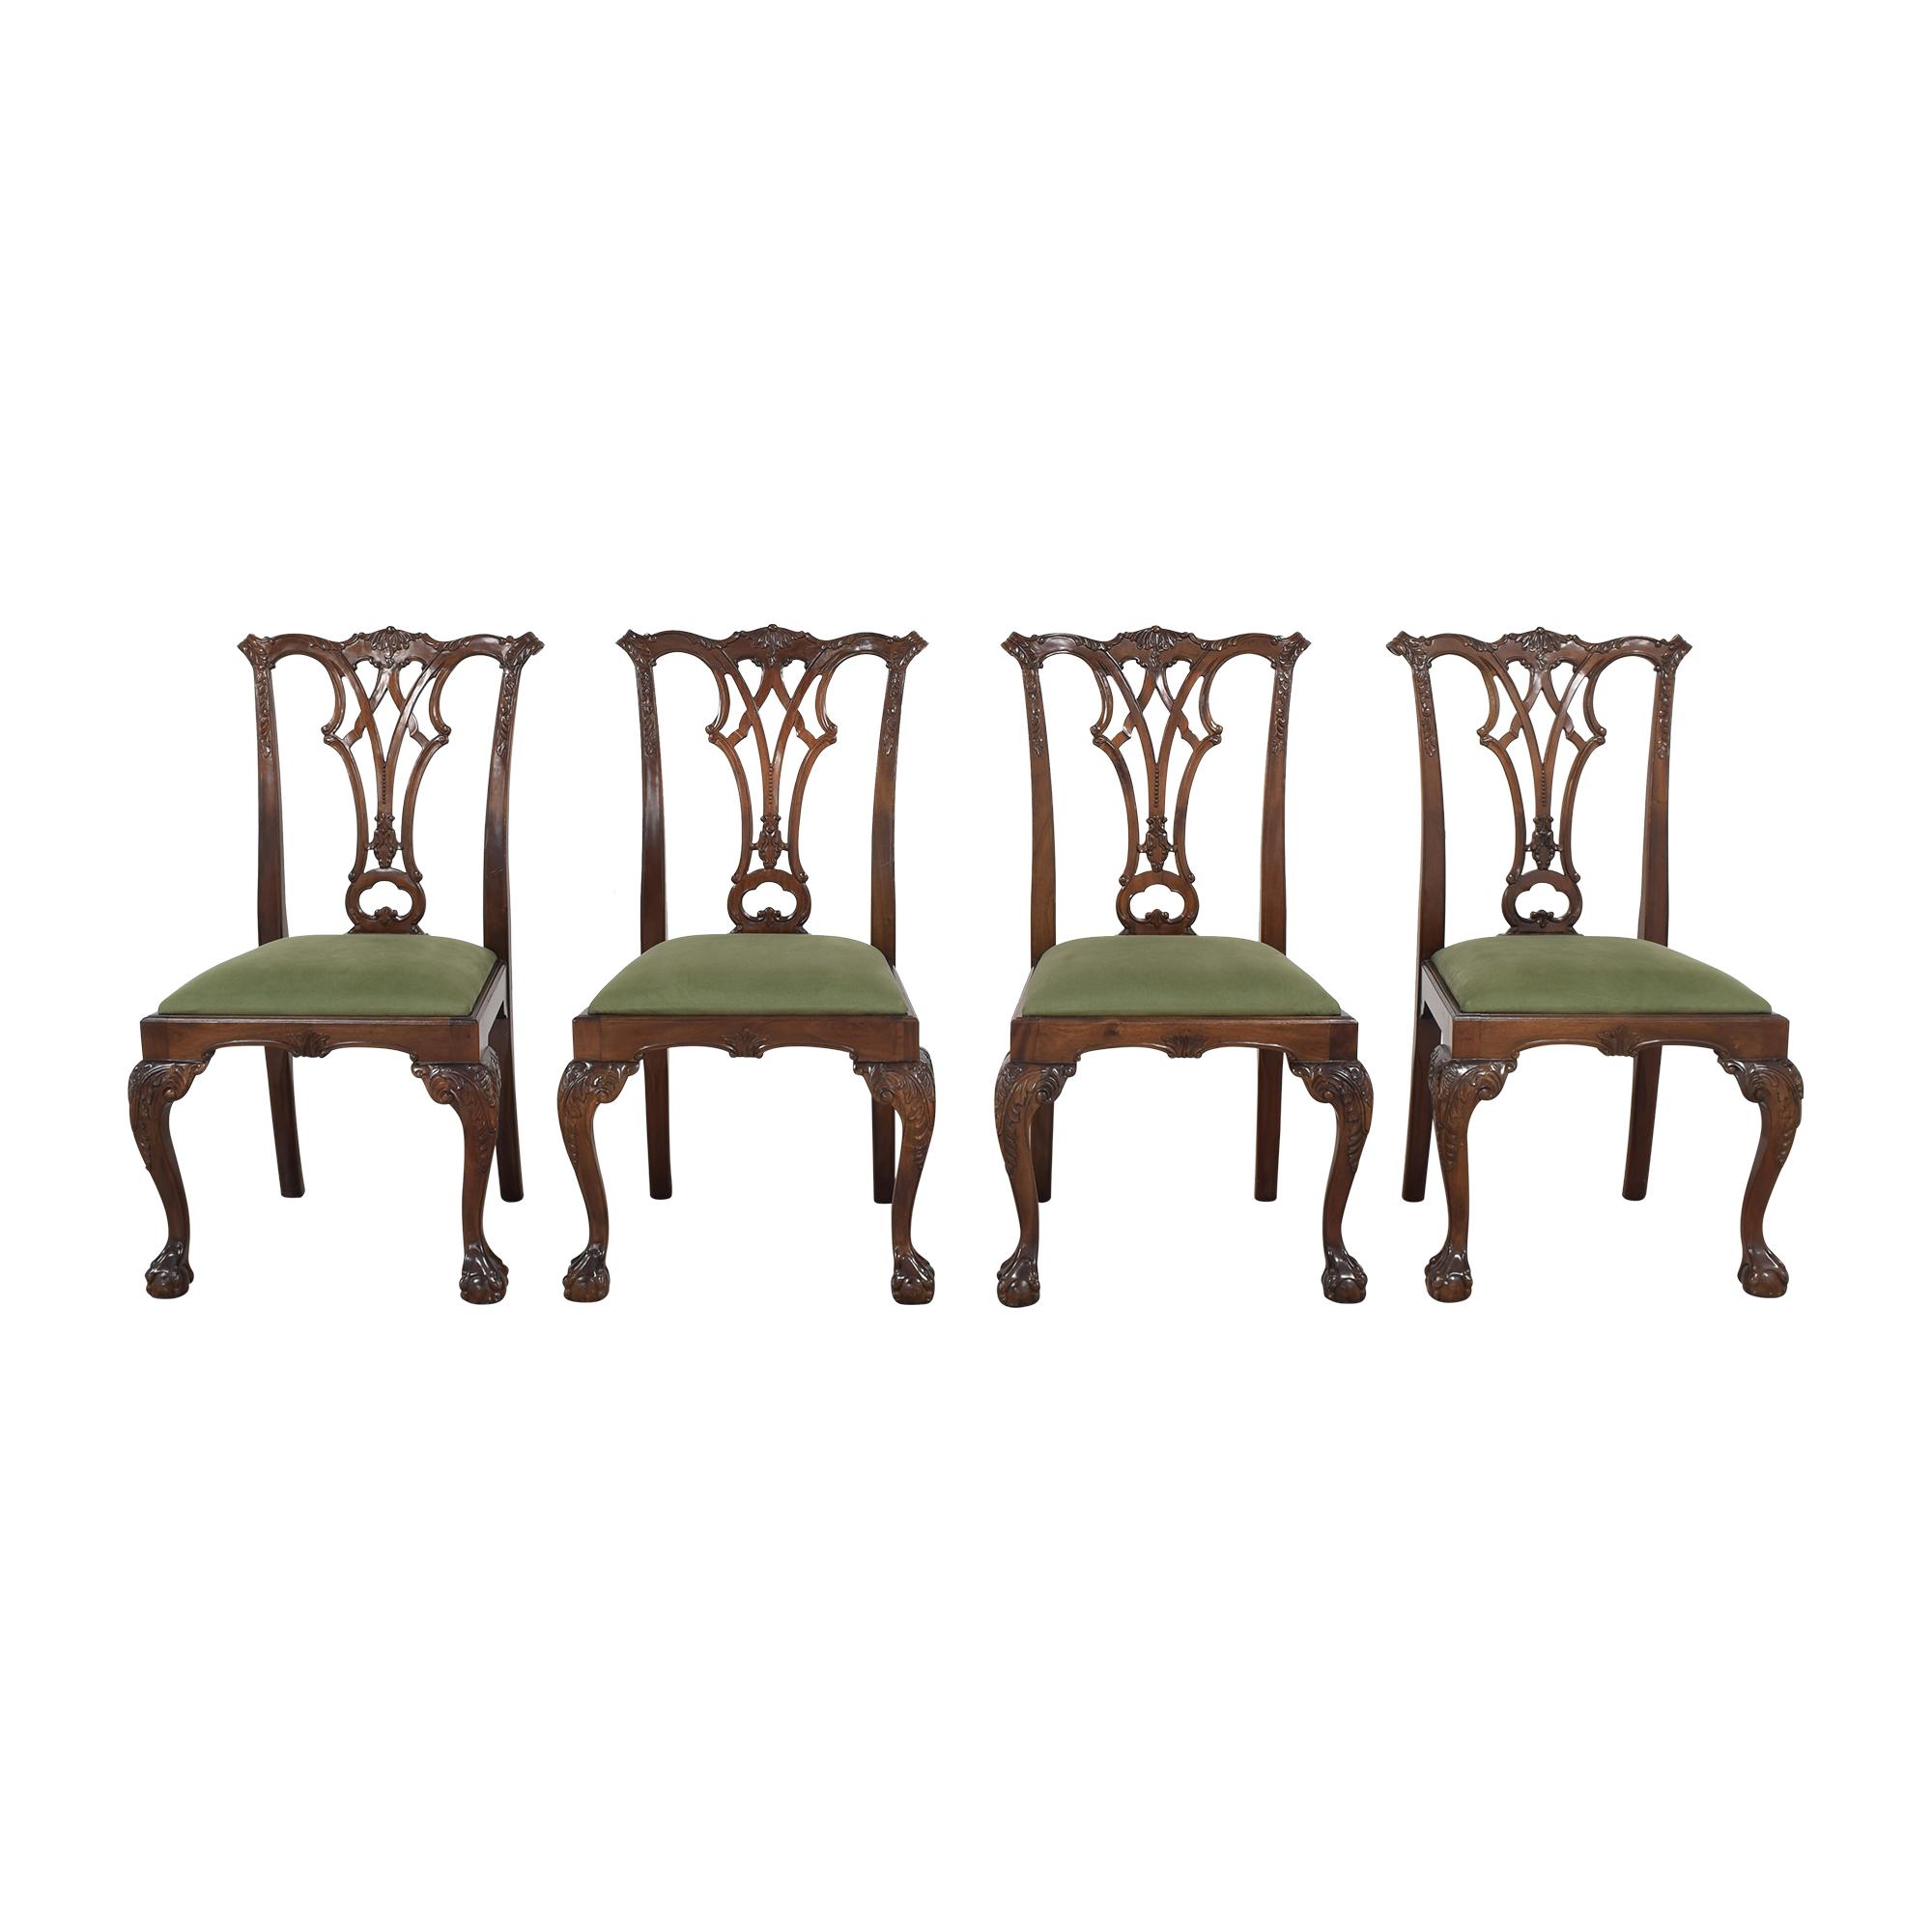 Greenbaum Interiors Greenbaum Interiors Vintage Upholstered Dining Chairs second hand